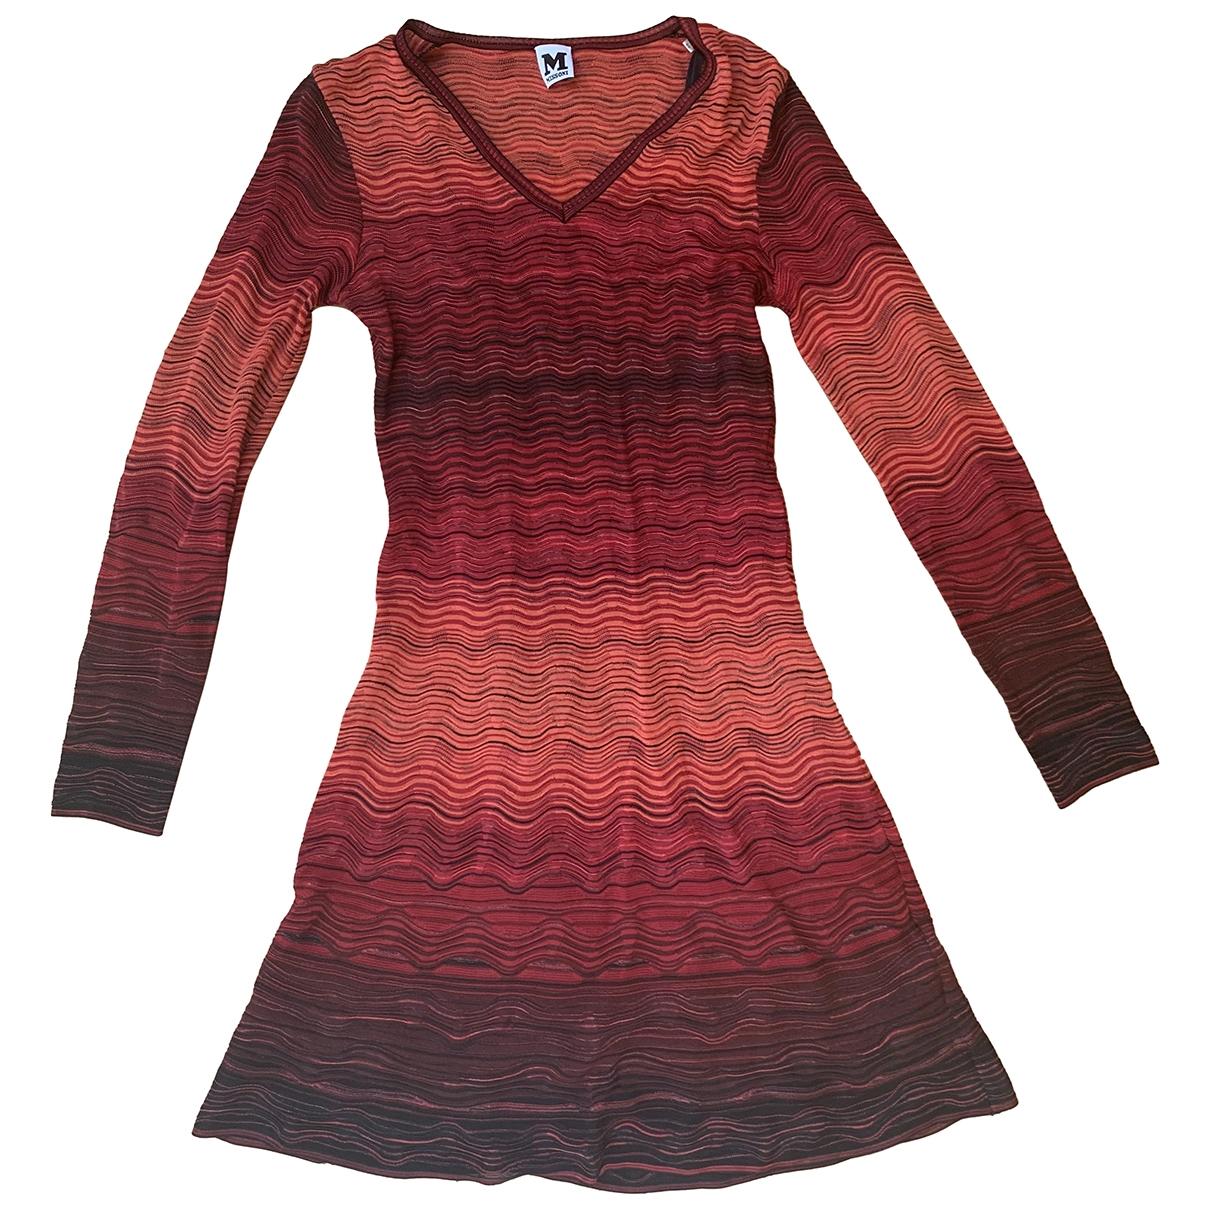 M Missoni \N Red dress for Women 40 IT